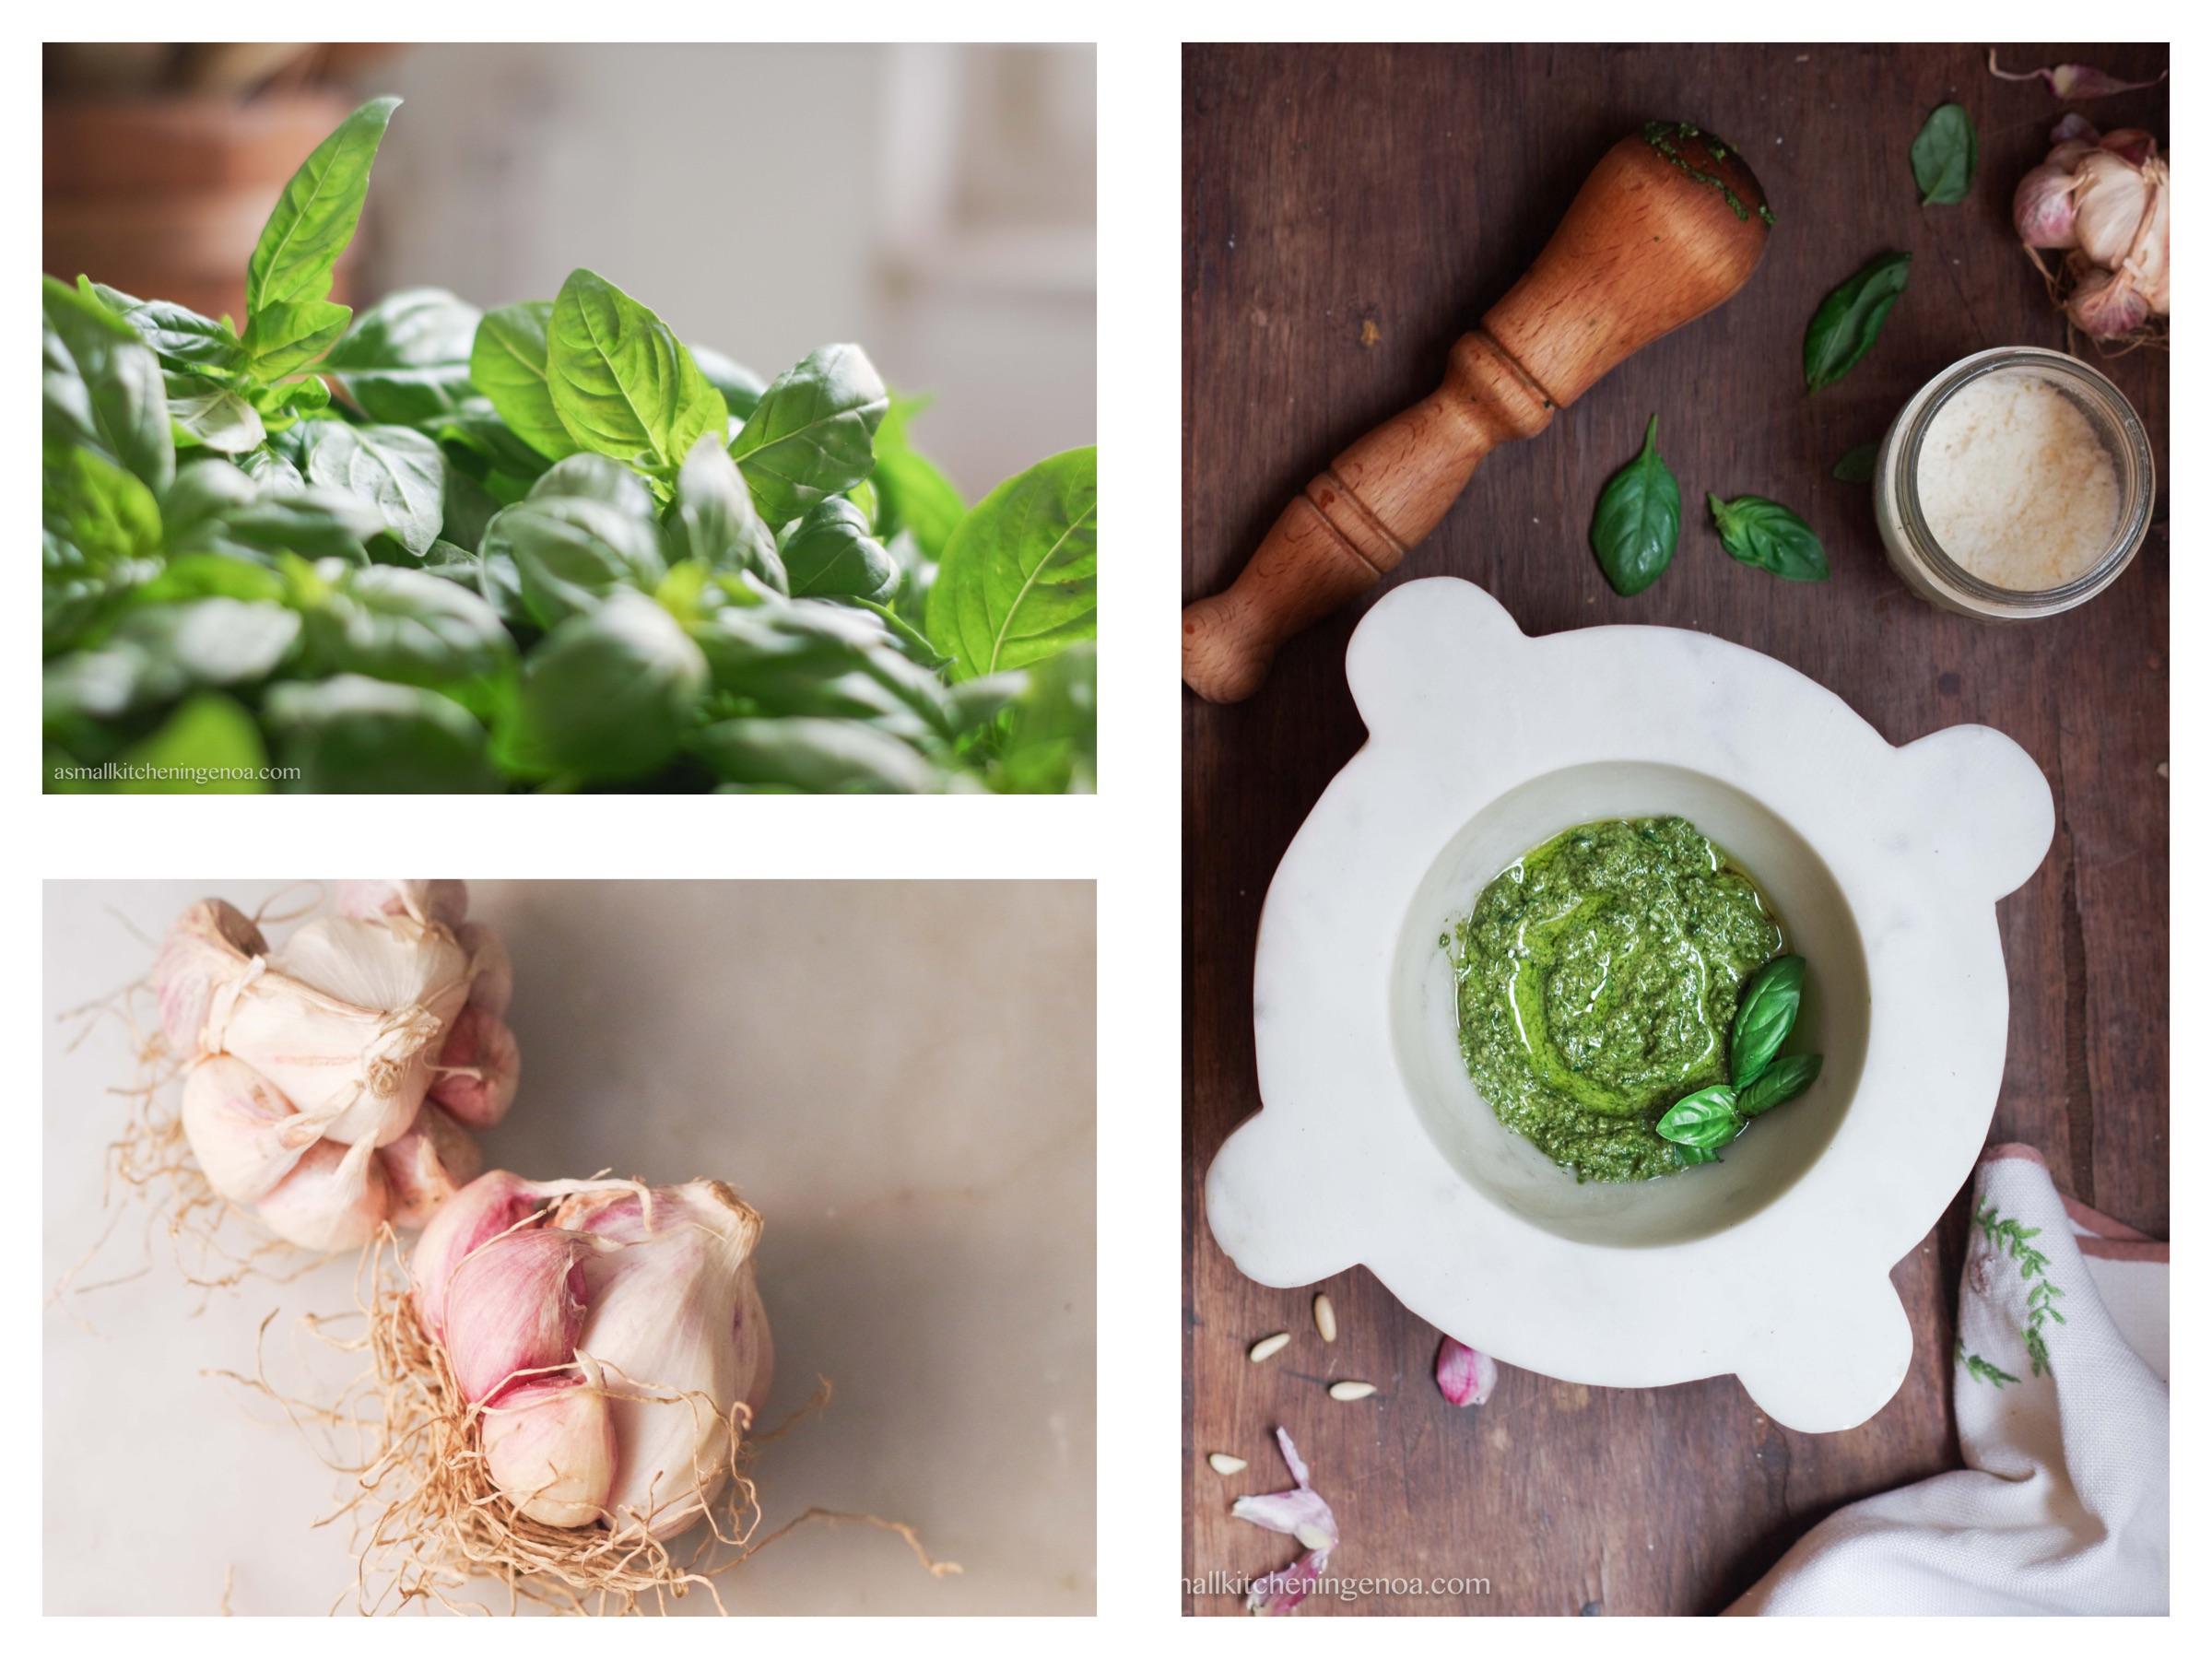 Genoa basil pesto sauce: pesto recipe, pesto ingredients, pesto secrets from Genoa